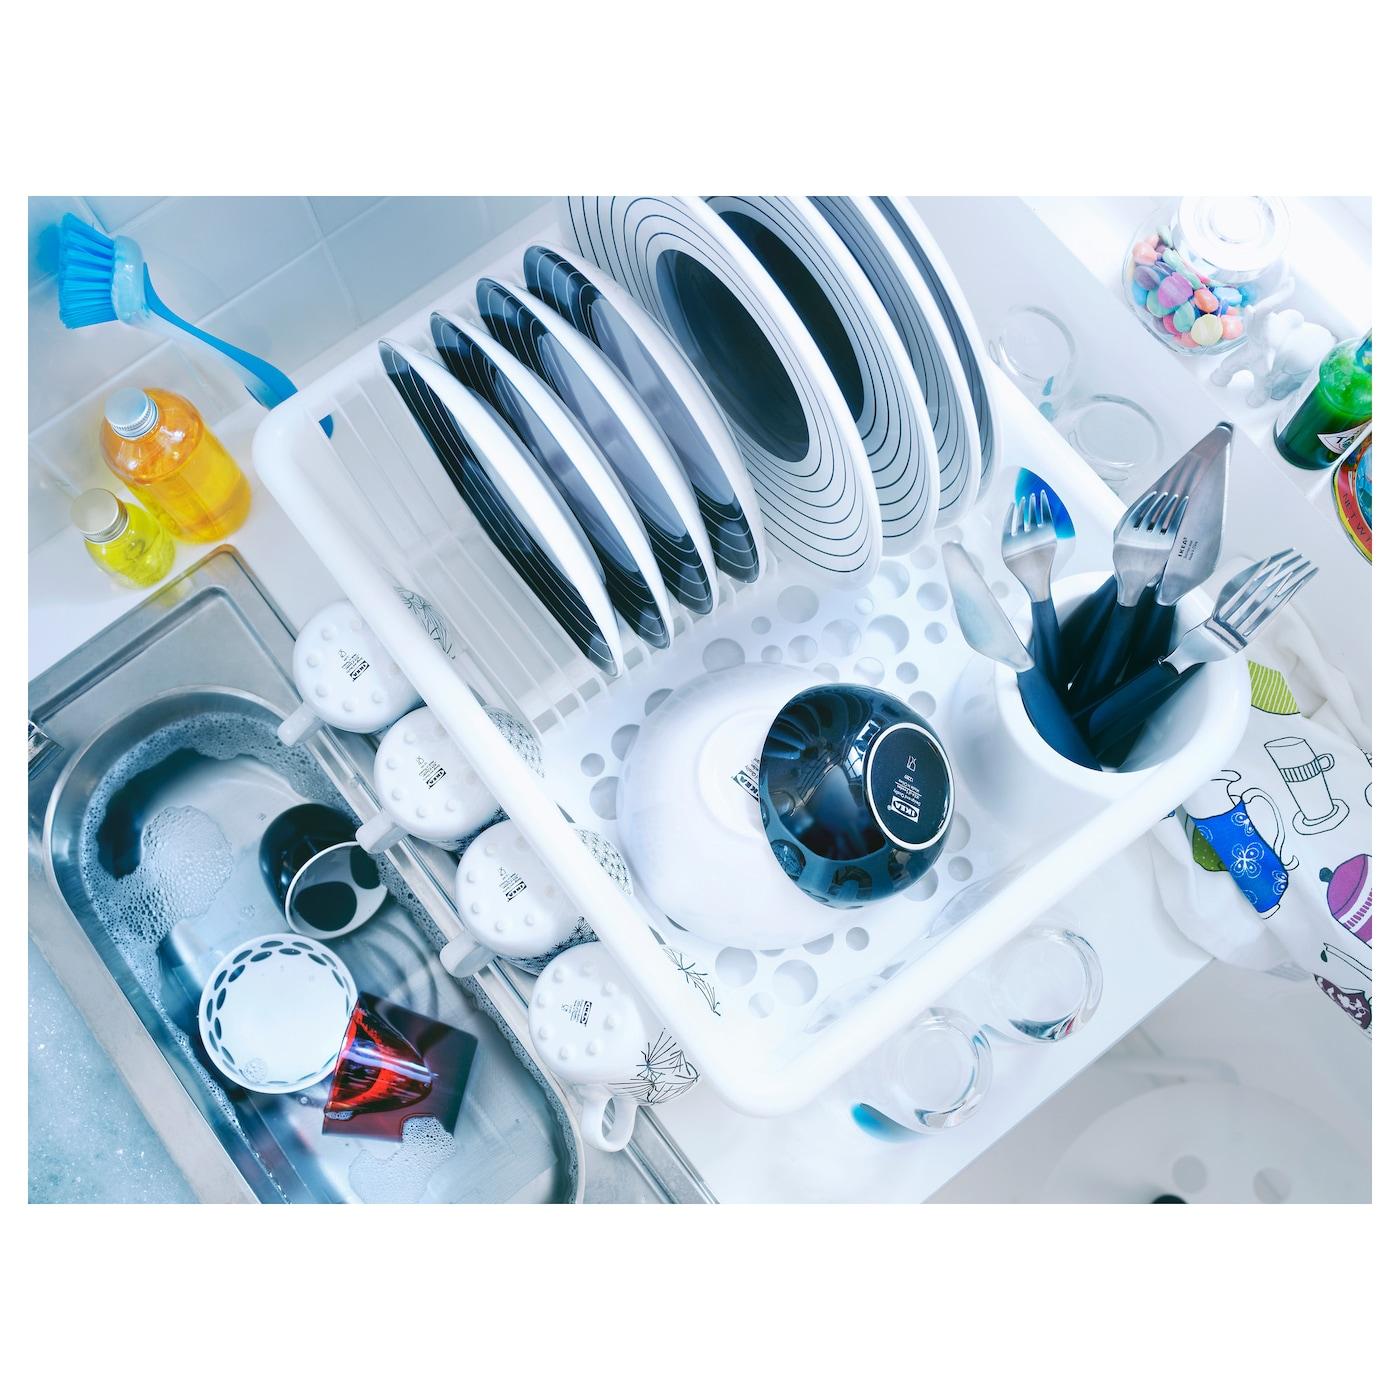 White Ikea Flundra Kitchen Dish Drainer Plastic Plate Cutlery Sink Drainer